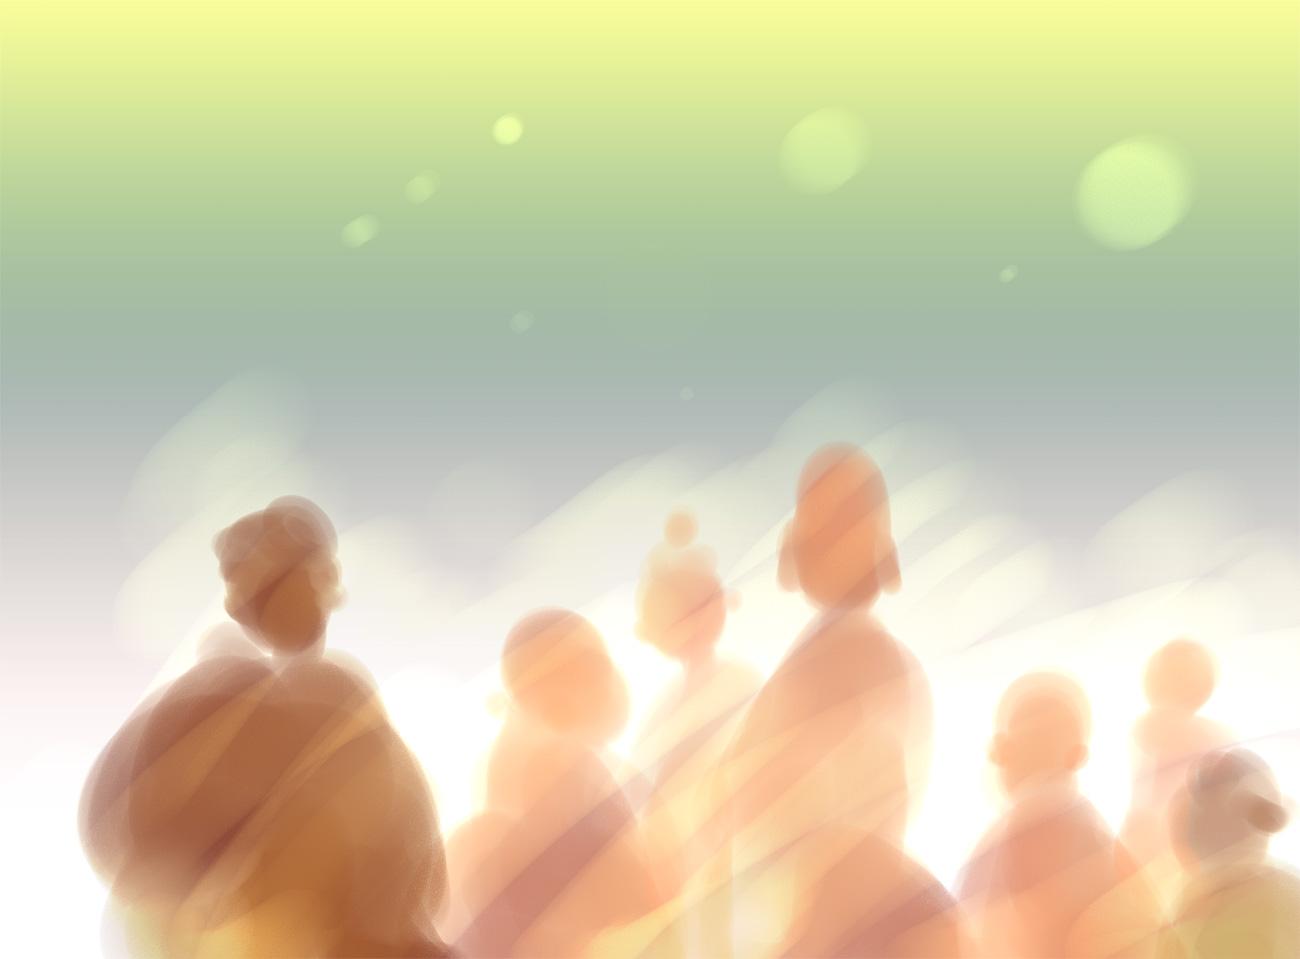 http://ahito.com/comic/ehon/voice/img//2017/20171223/03.jpg